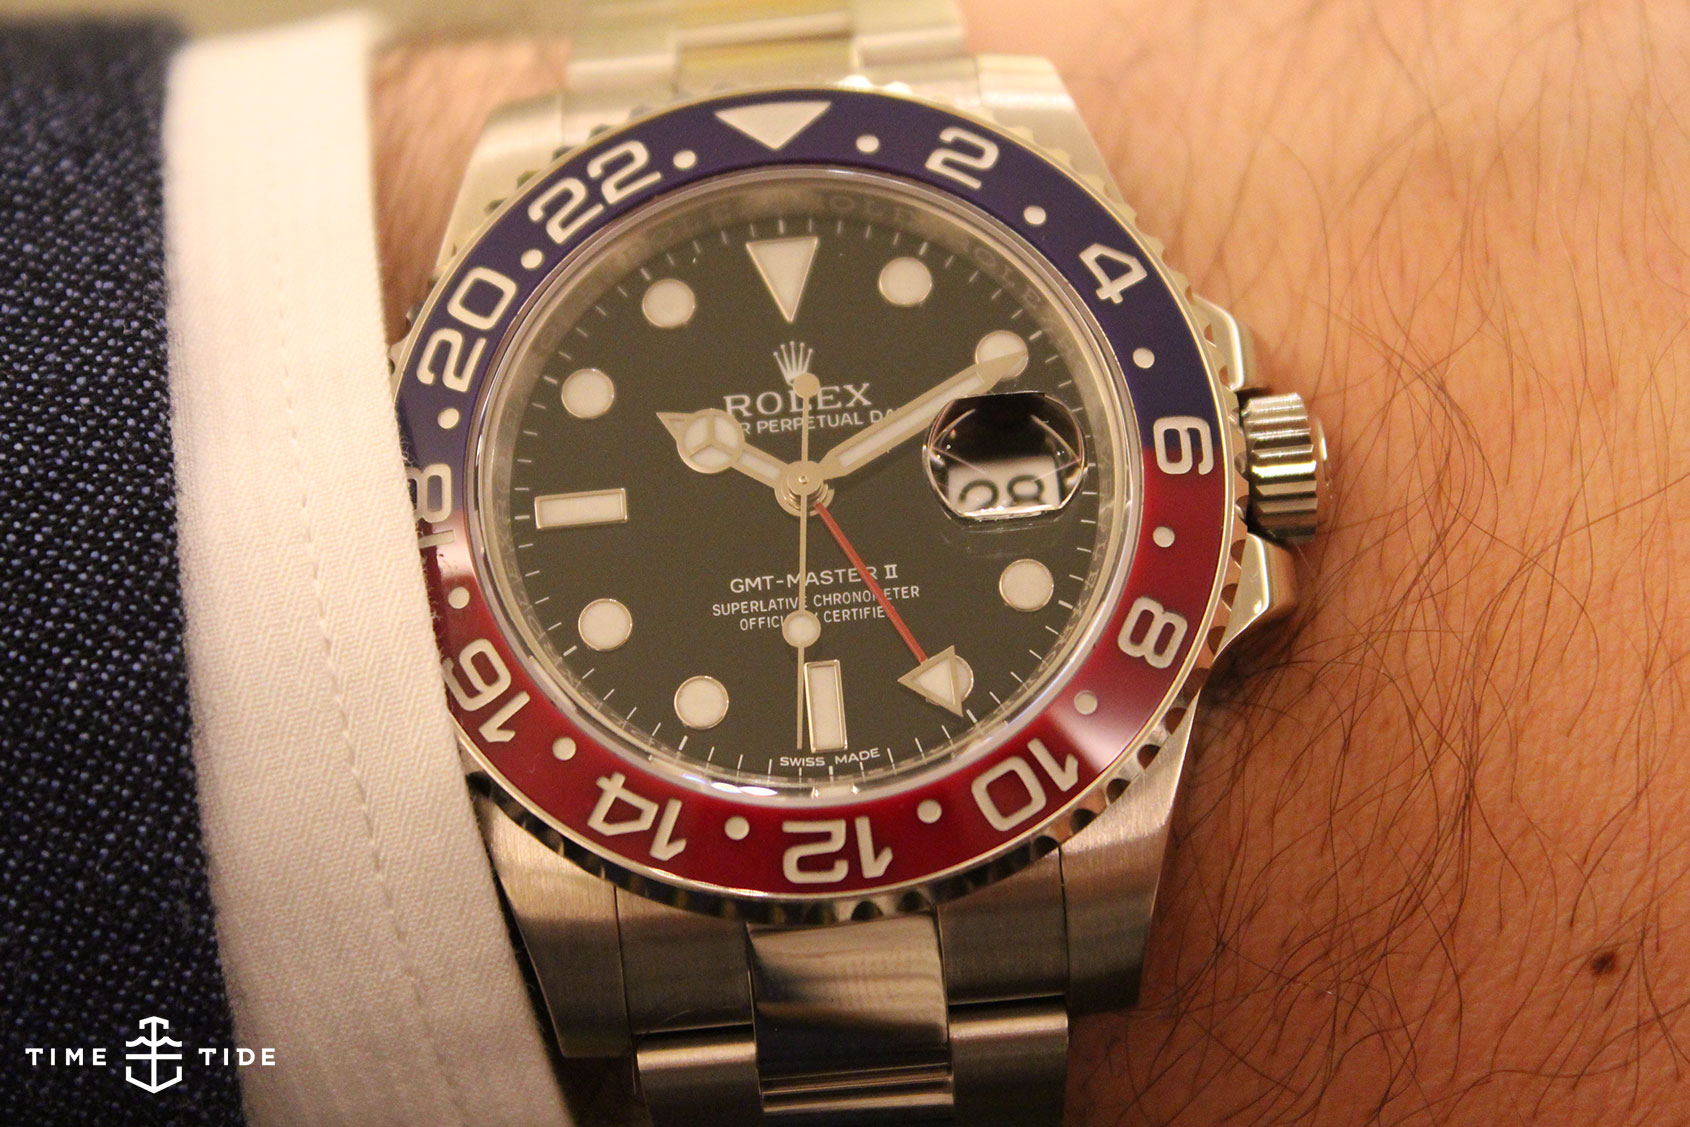 New Rolex Models On The Wrist Baselworld 2014